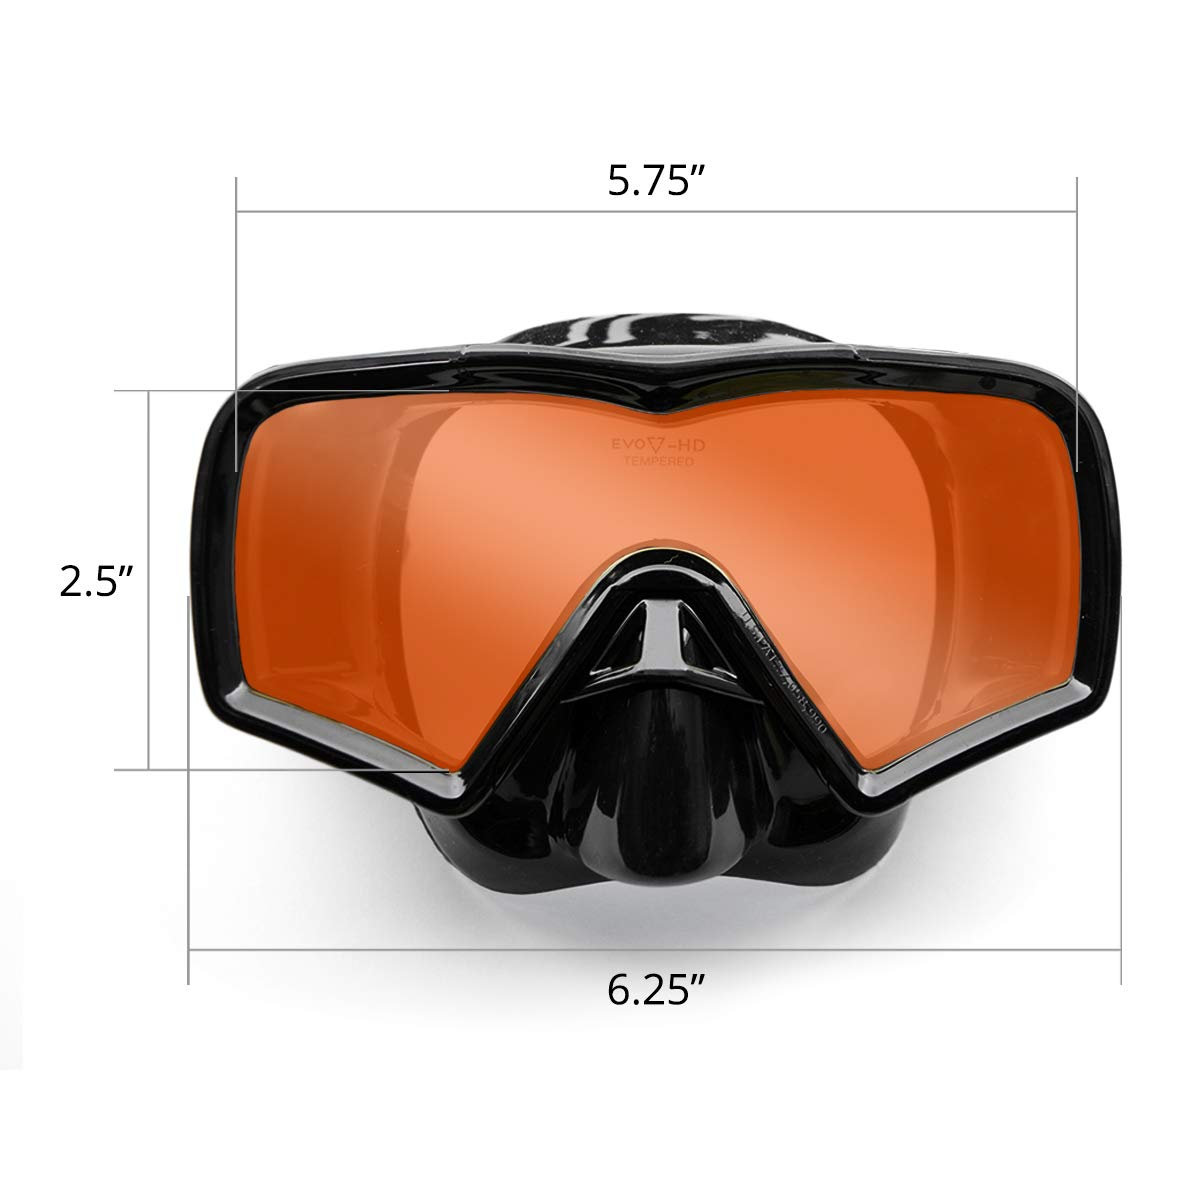 EVO Hi Definition Snorkel Combo - Single Lens Mask Dimensions